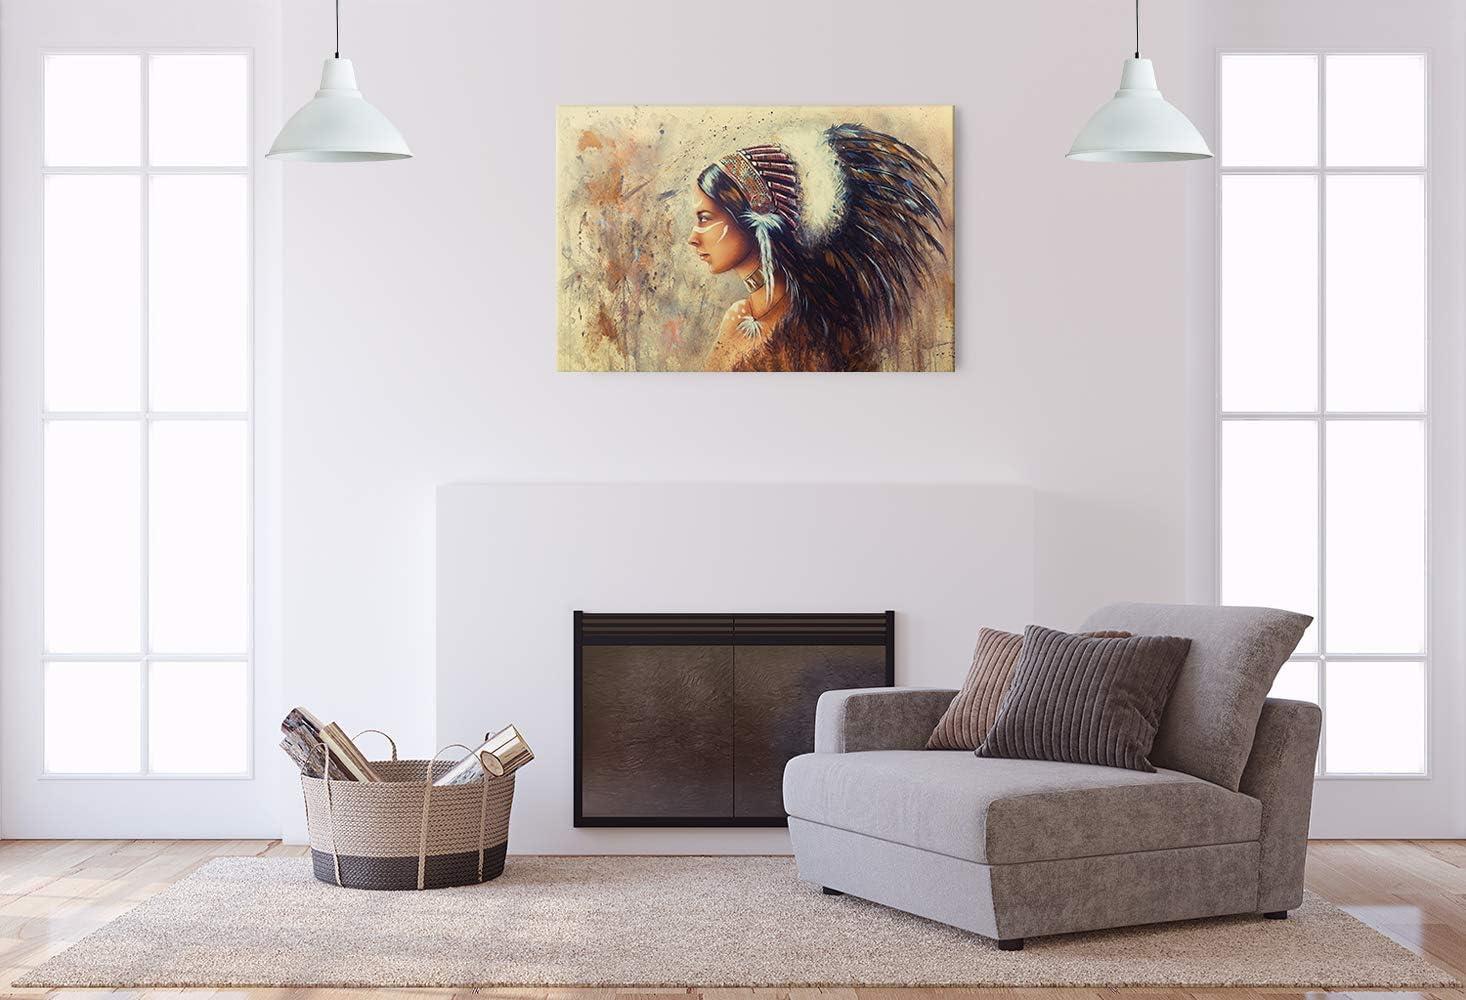 Malerei Frau Untertitel Blau lila Revolio 40x30 cm Leinwandbild Wandbilder Wohnzimmer Modern Kunstdruck Design Wanddekoration Deko Bild auf Leinwand Bilder 1 Teilig